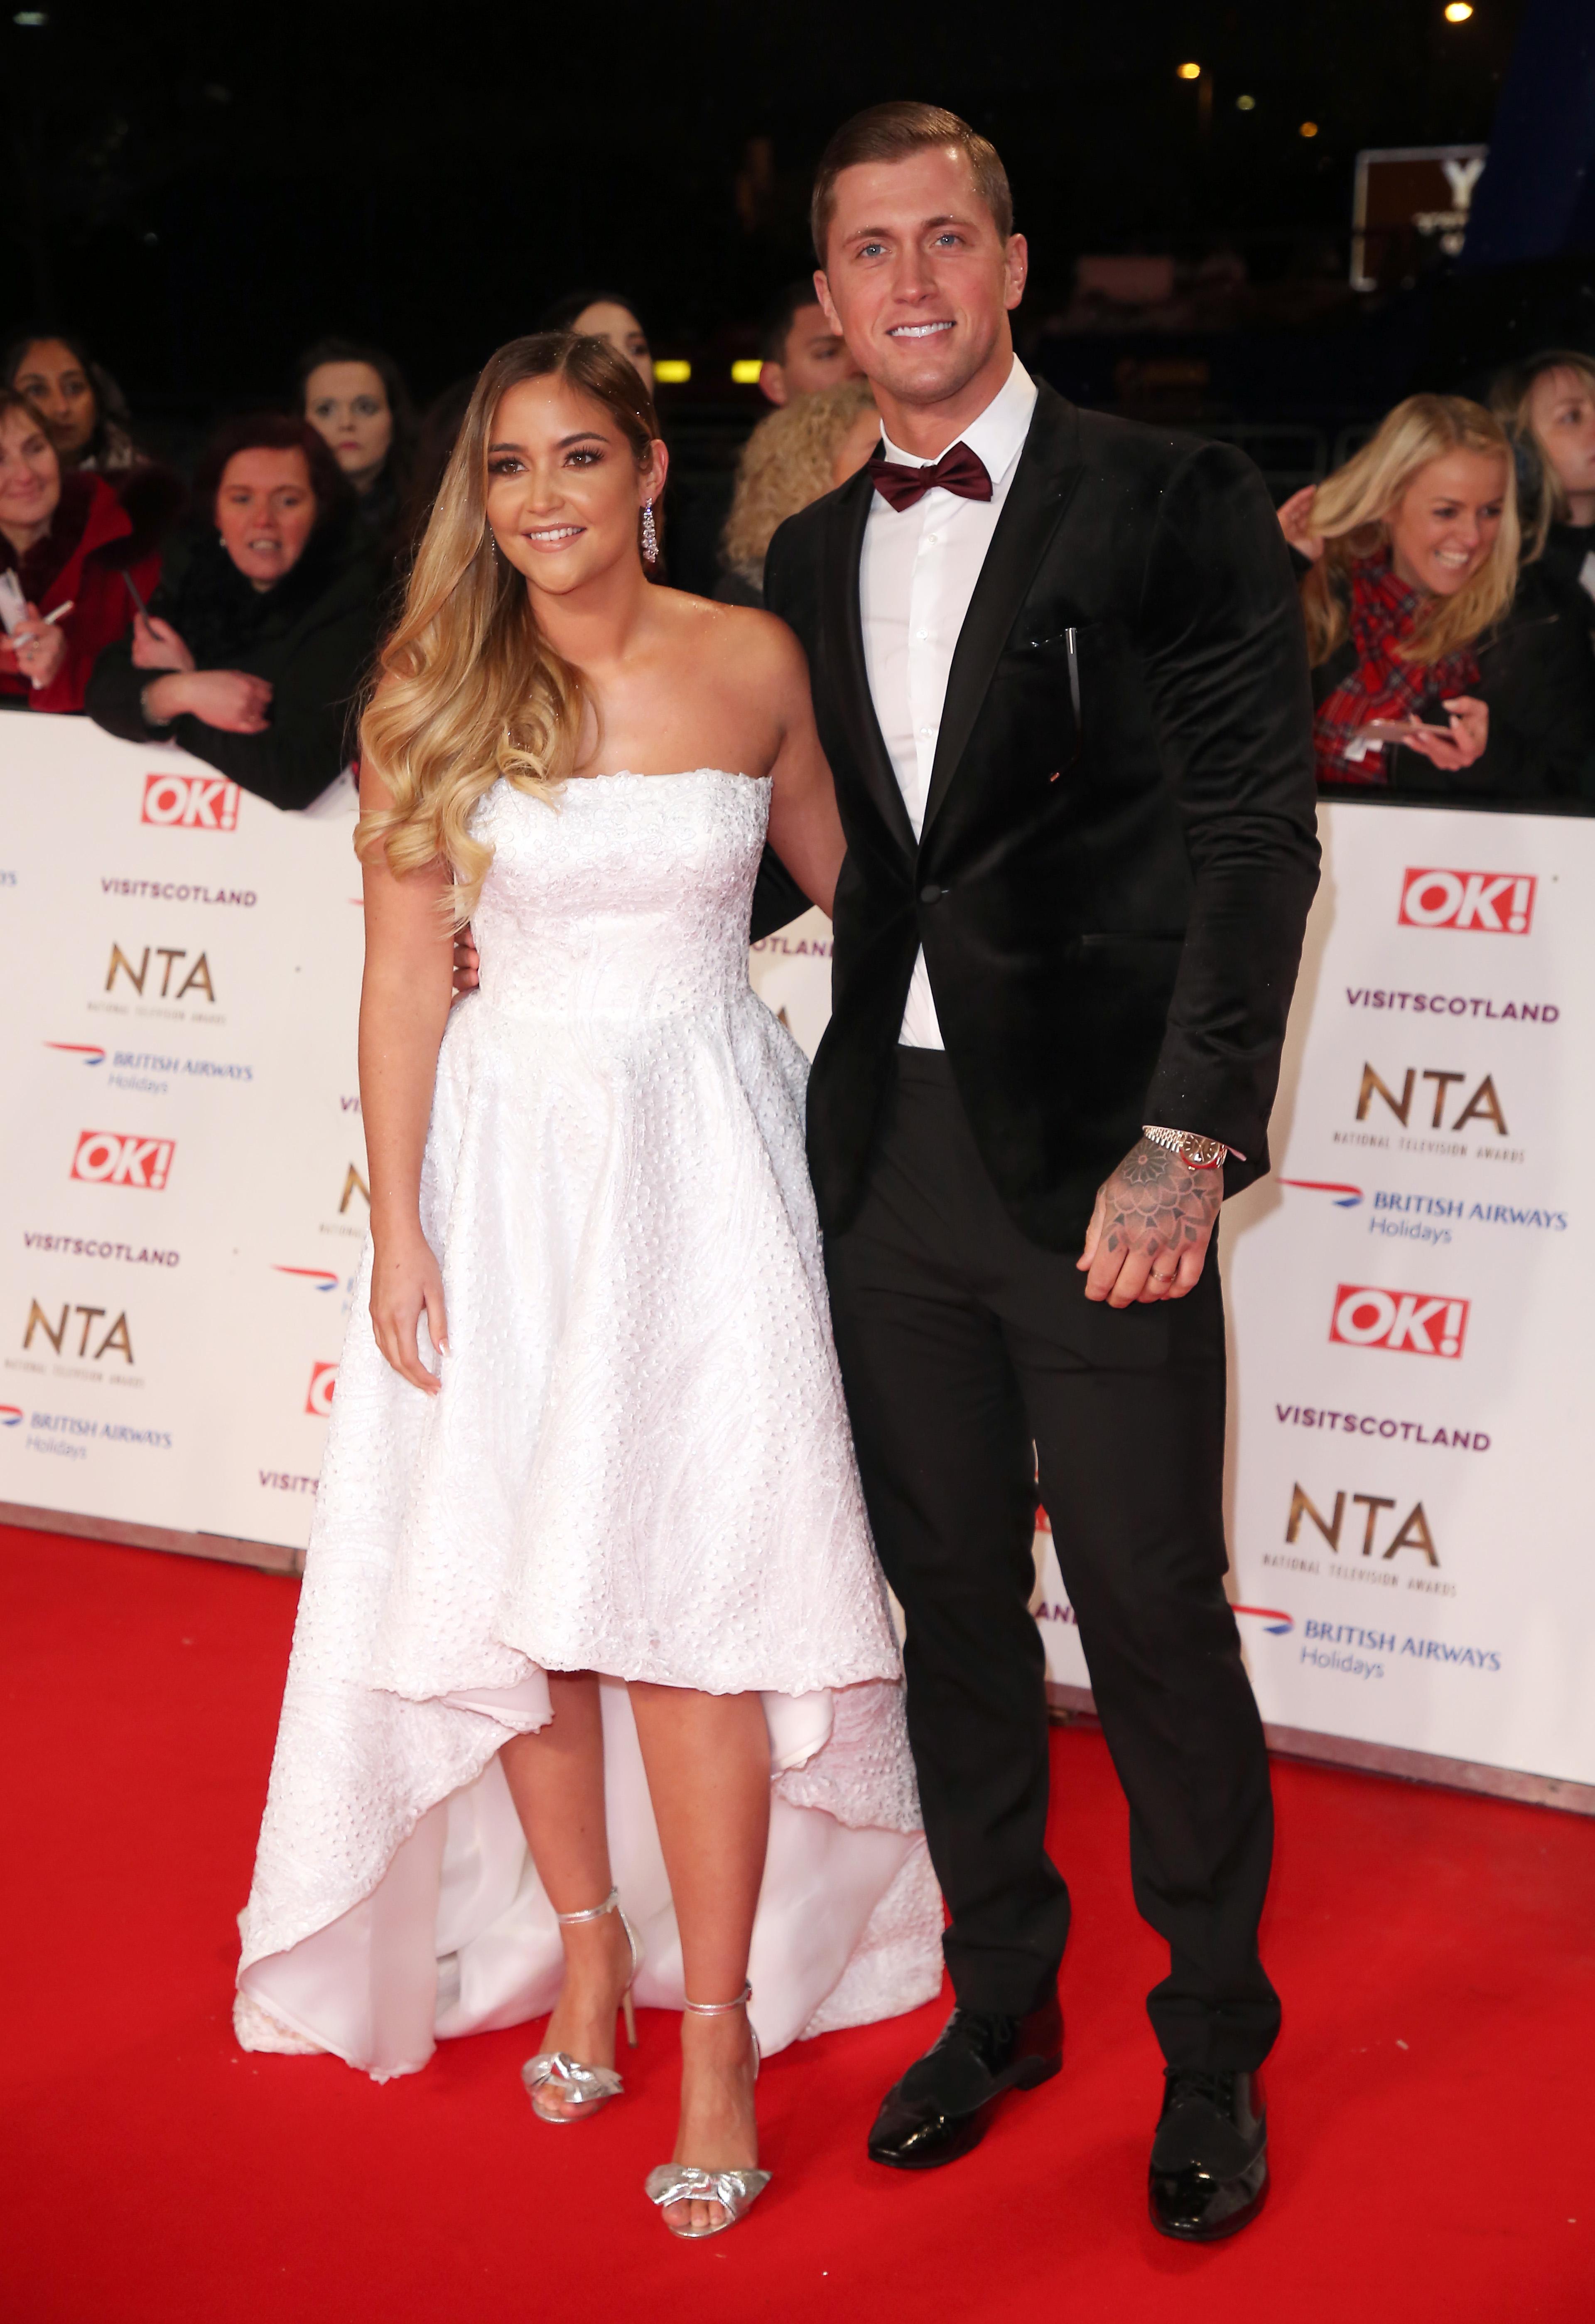 Jacqueline Jossa and Dan Osborne at The National Television Awards 2019